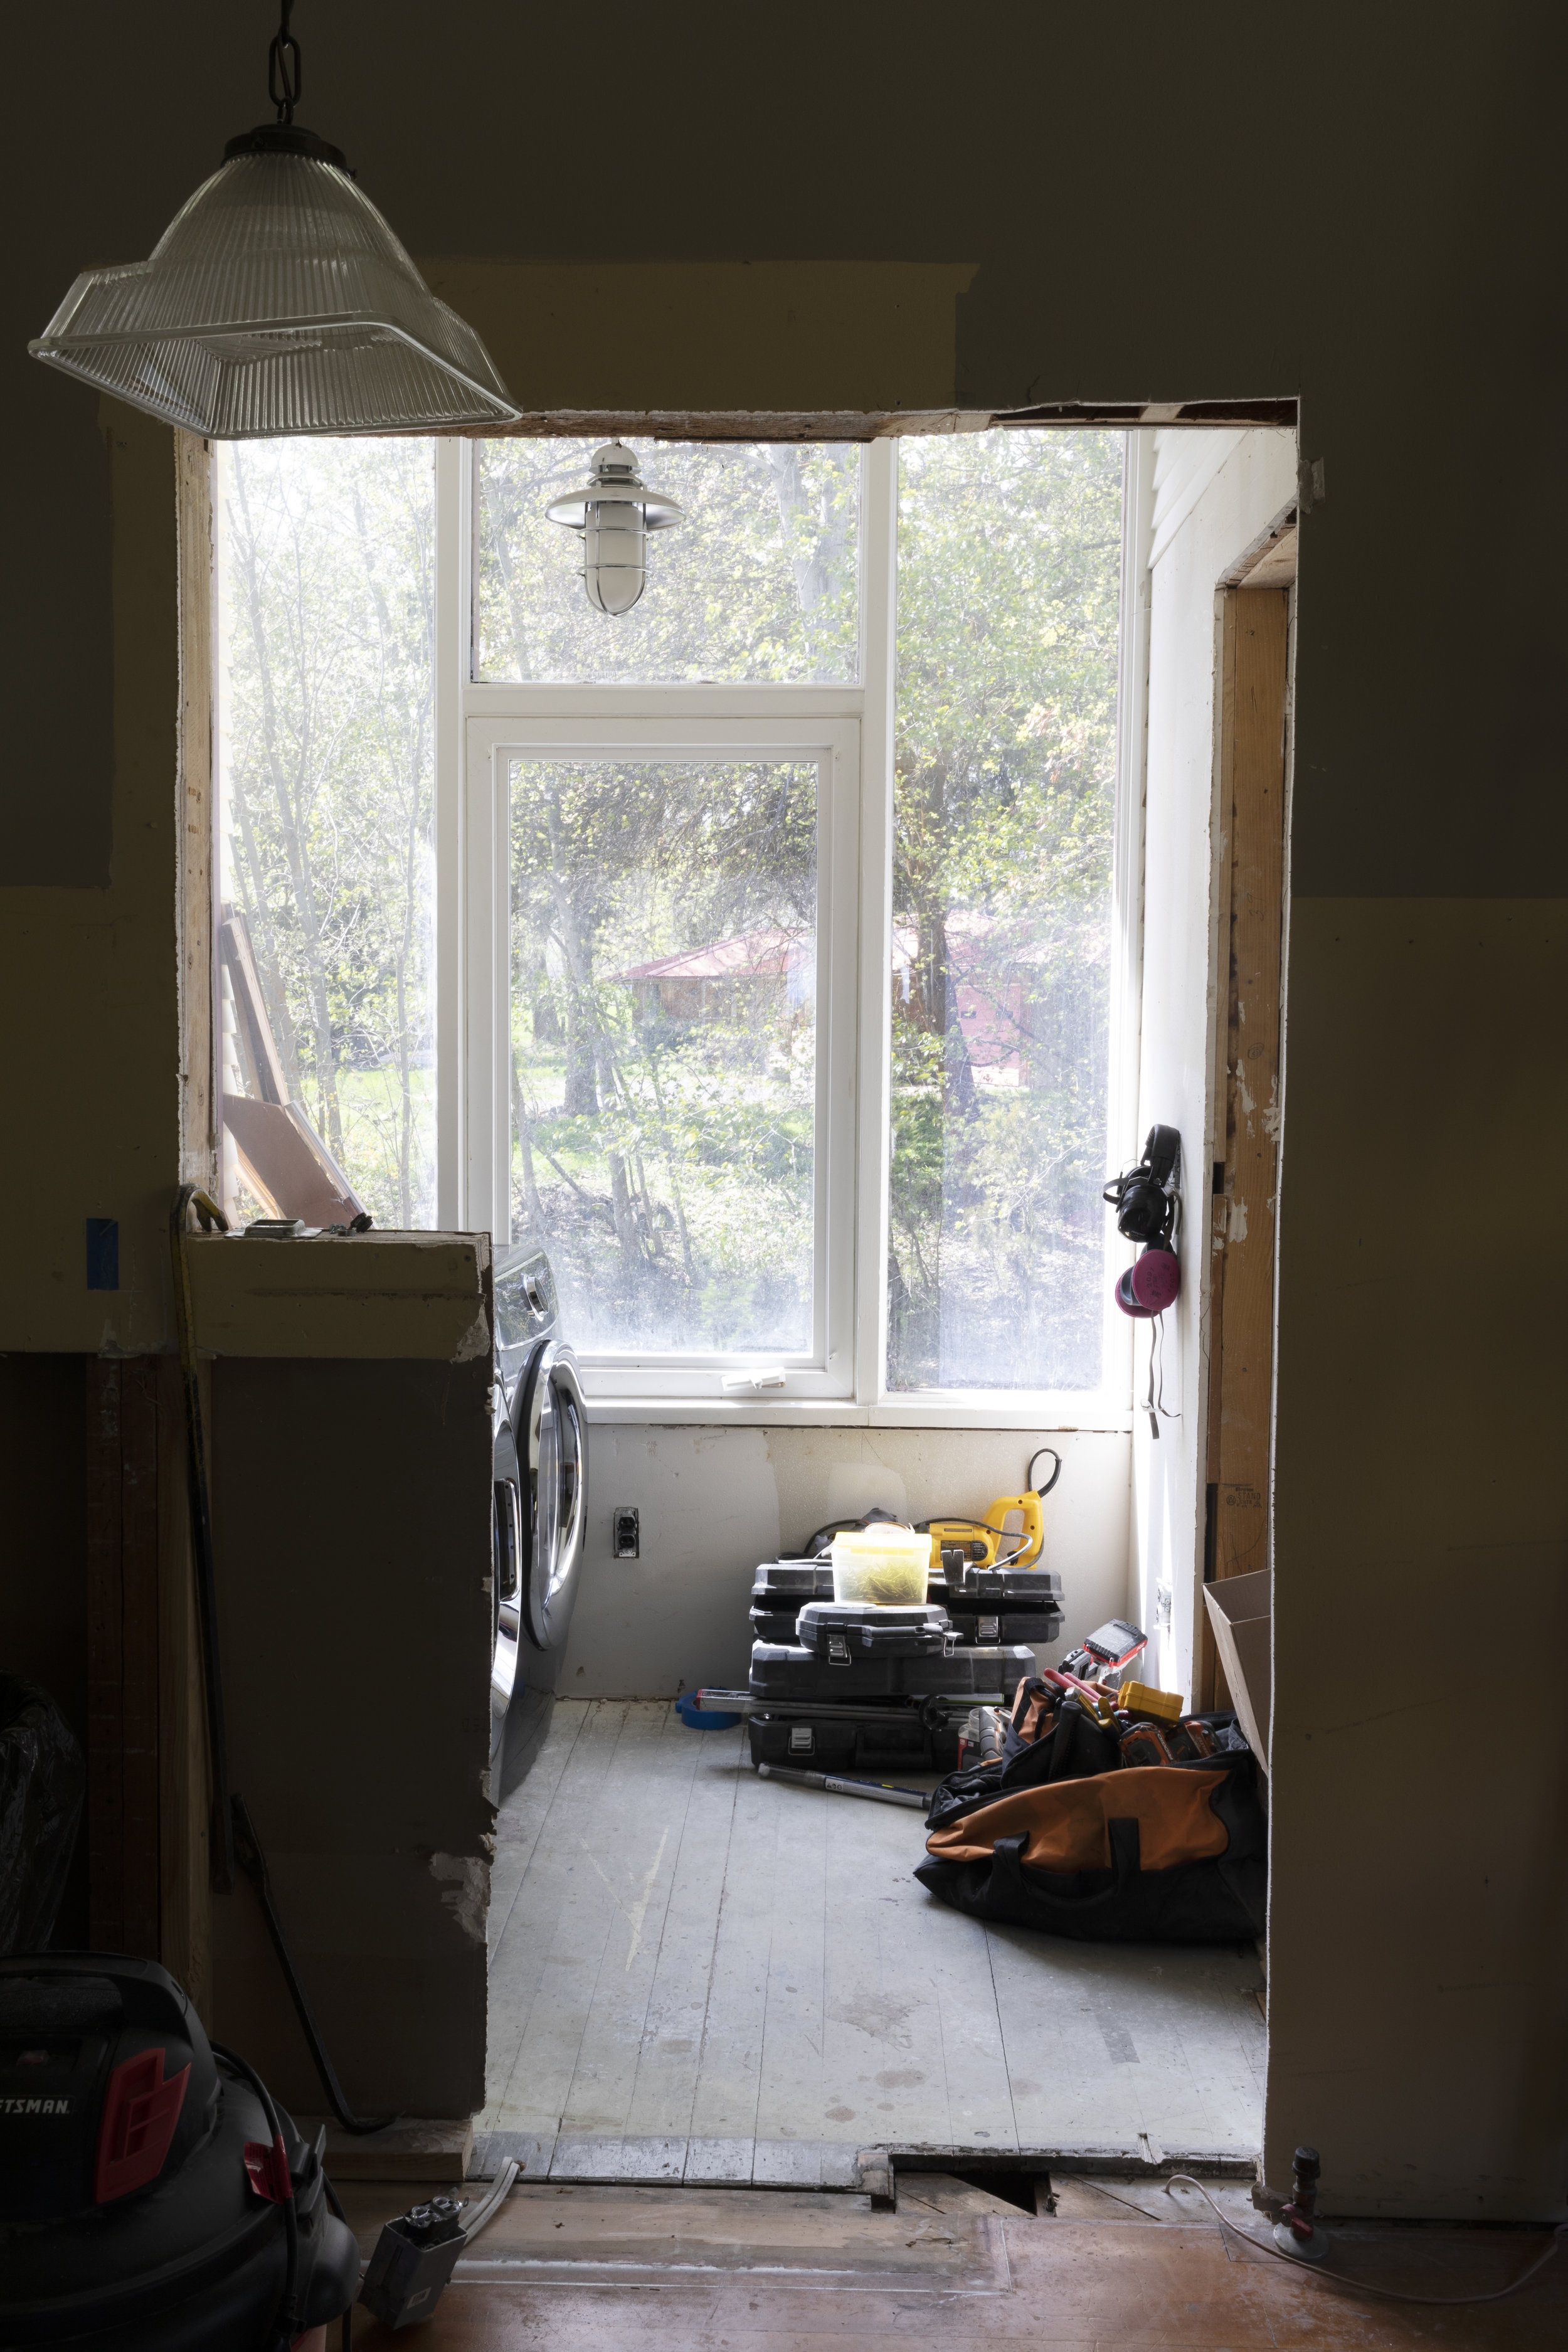 The Grit and Polish - Farmhouse Laundry Room Windows Existing.jpg